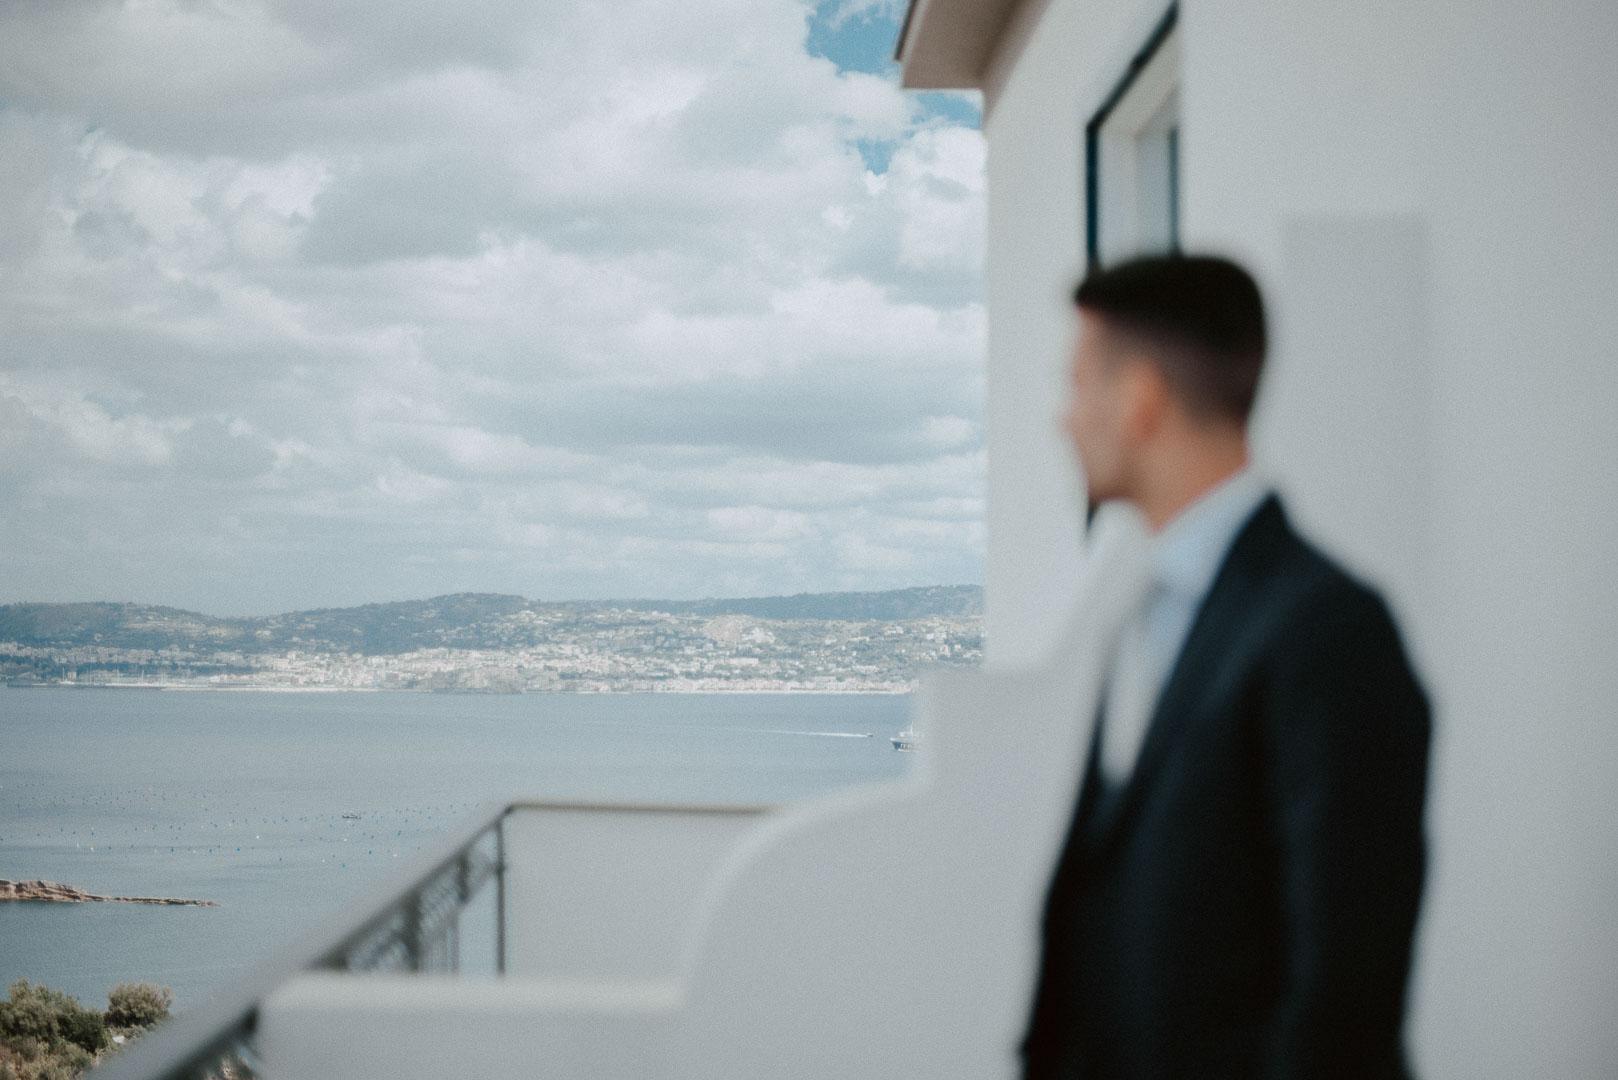 wedding-photographer-destination-fineart-bespoke-reportage-napoli-nabilah-vivianeizzo-spazio46-15